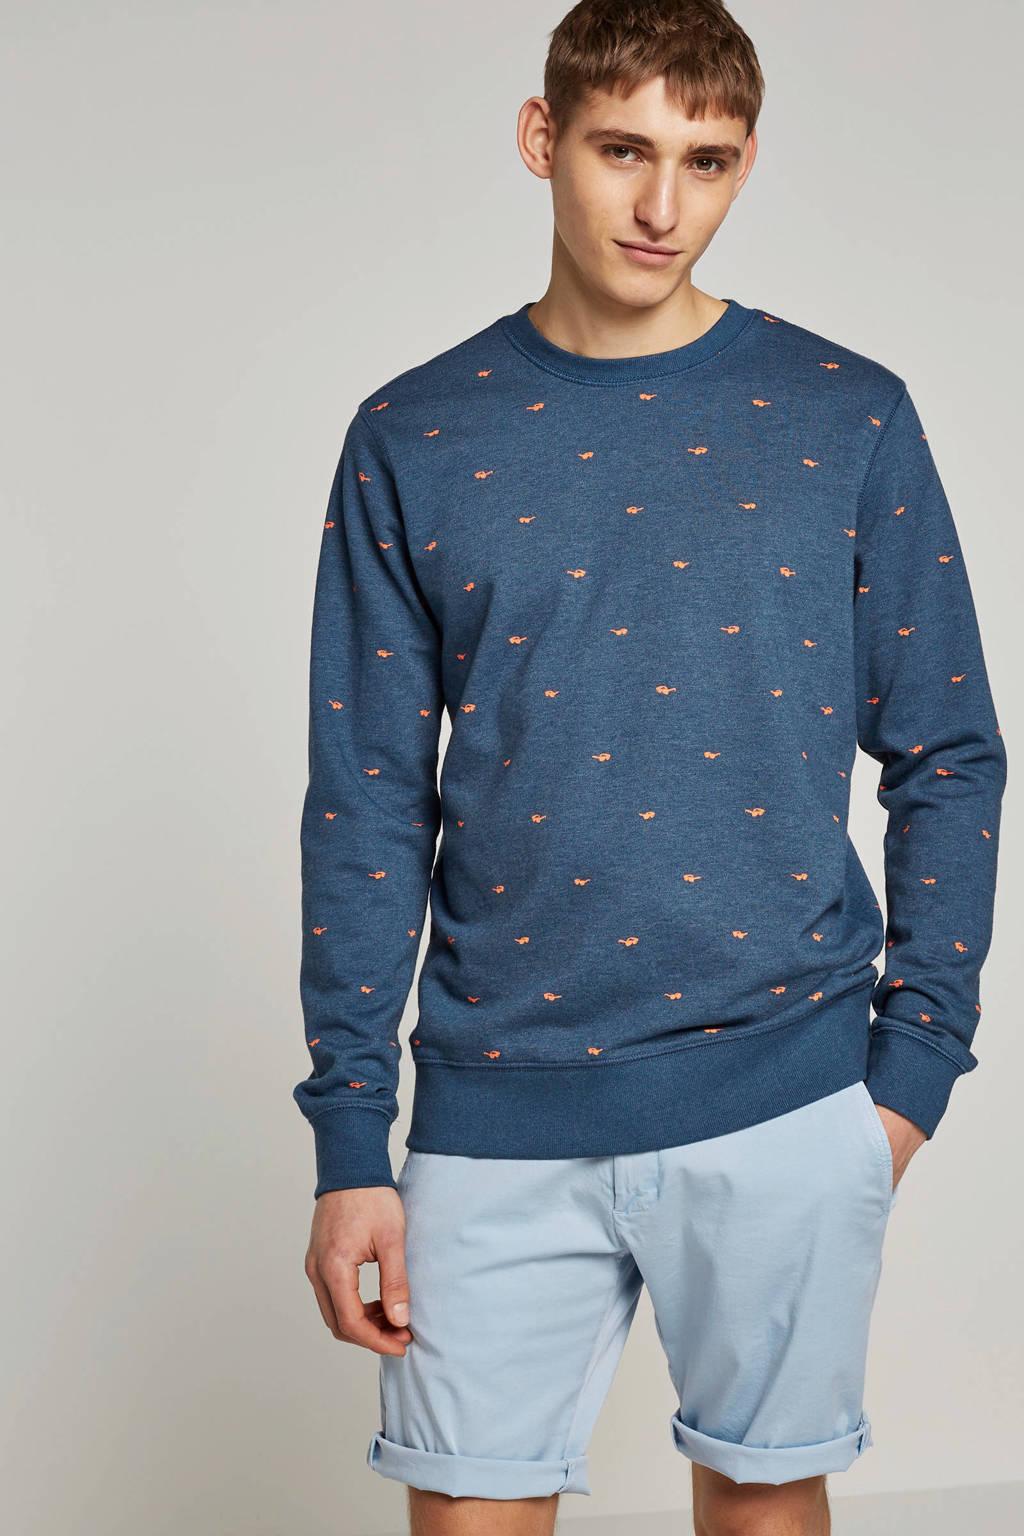 Petrol Industries sweater, Donkerblauw